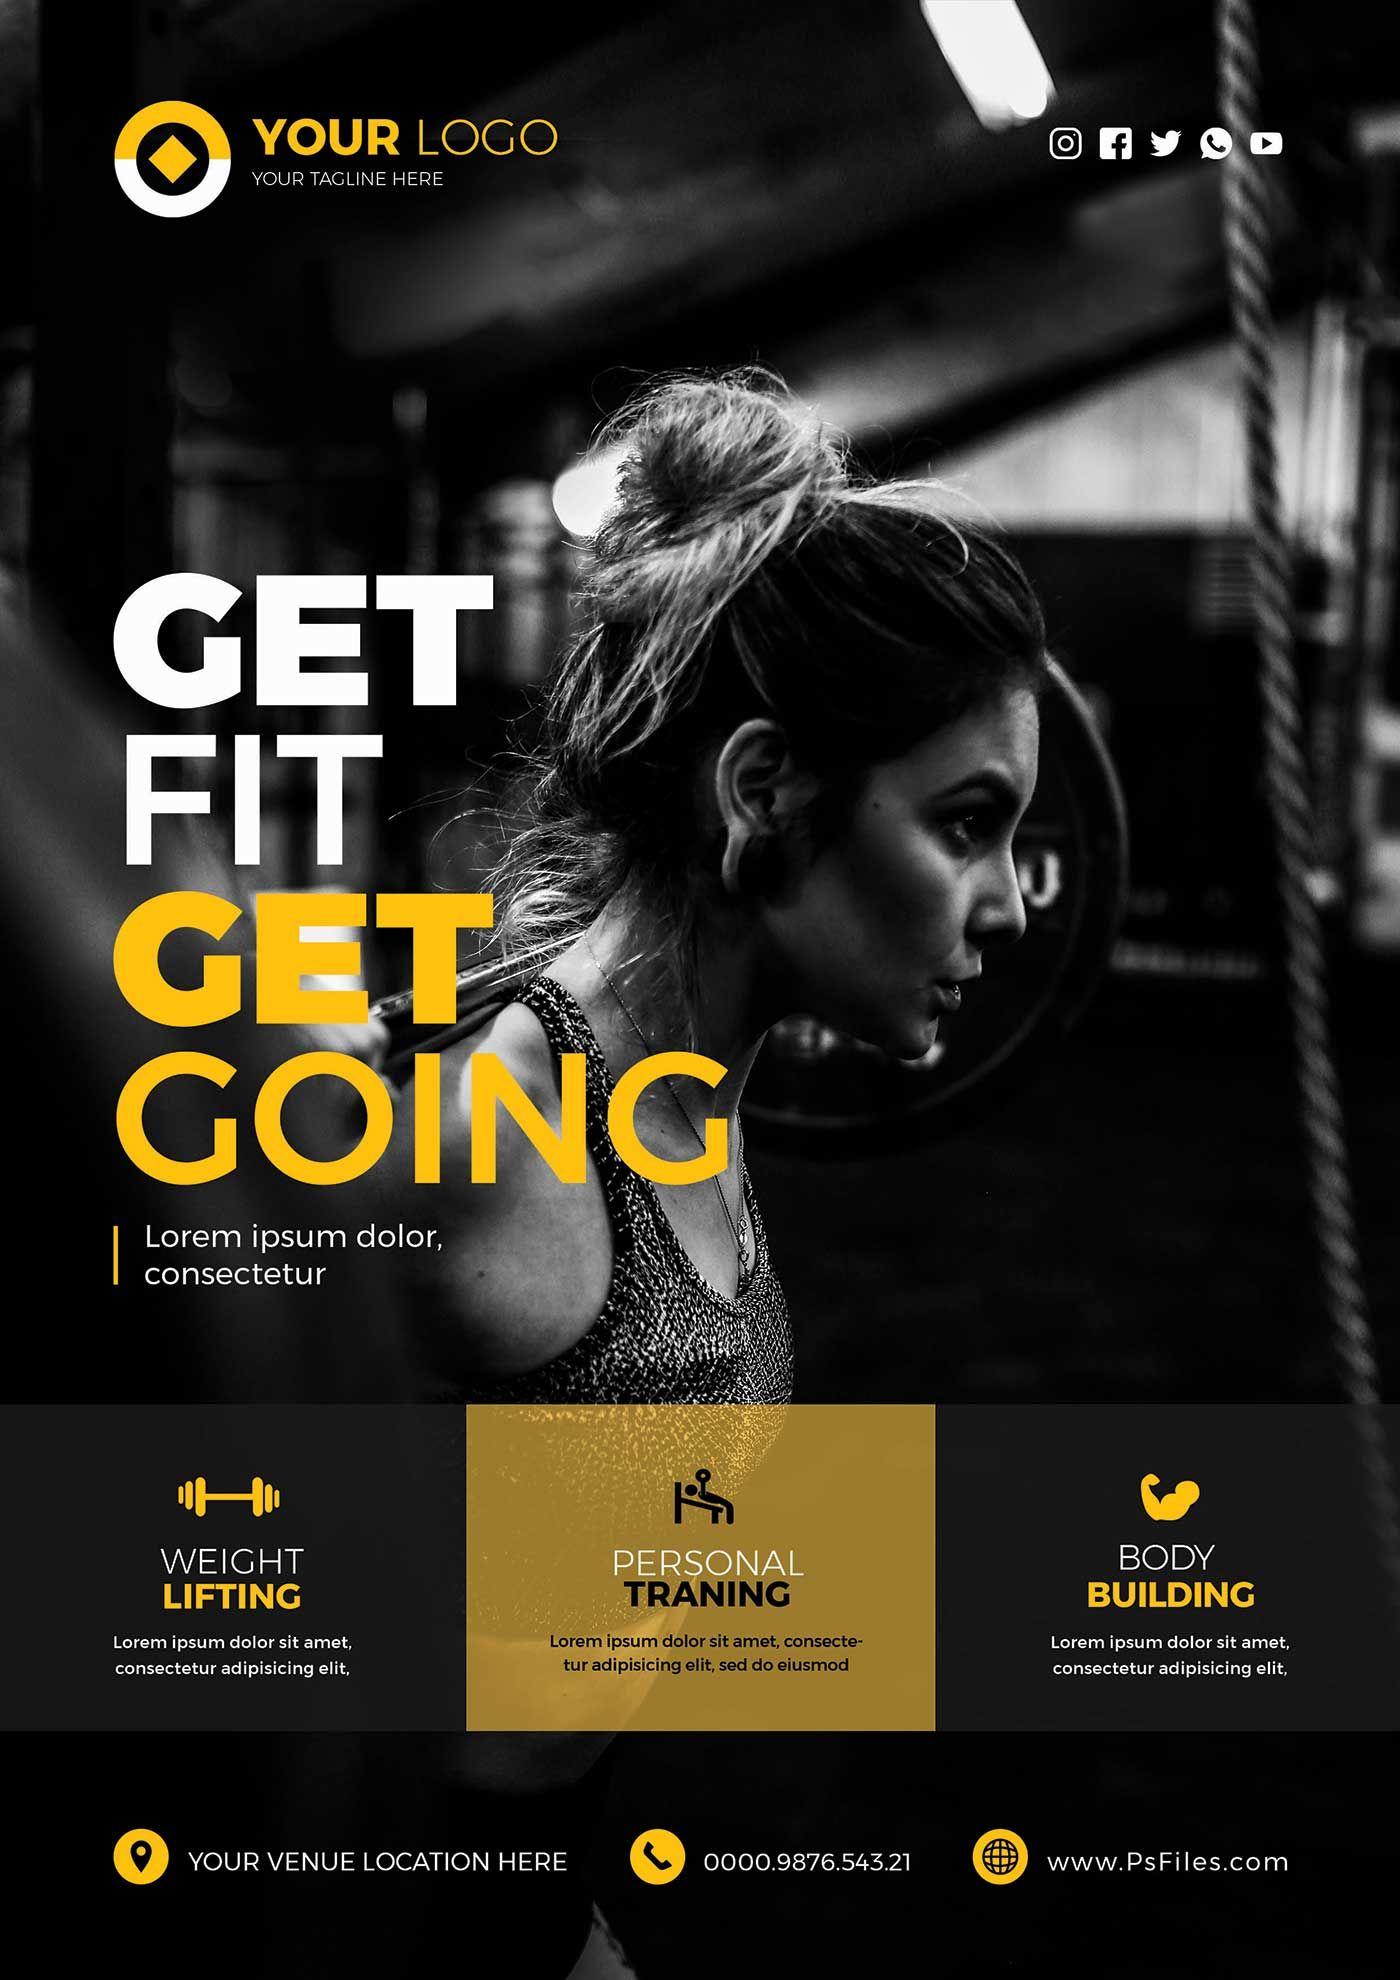 Health Fitness Club Free Psd Flyer Templates Fitness Flyer Free Psd Flyer Templates Psd Flyer Templates